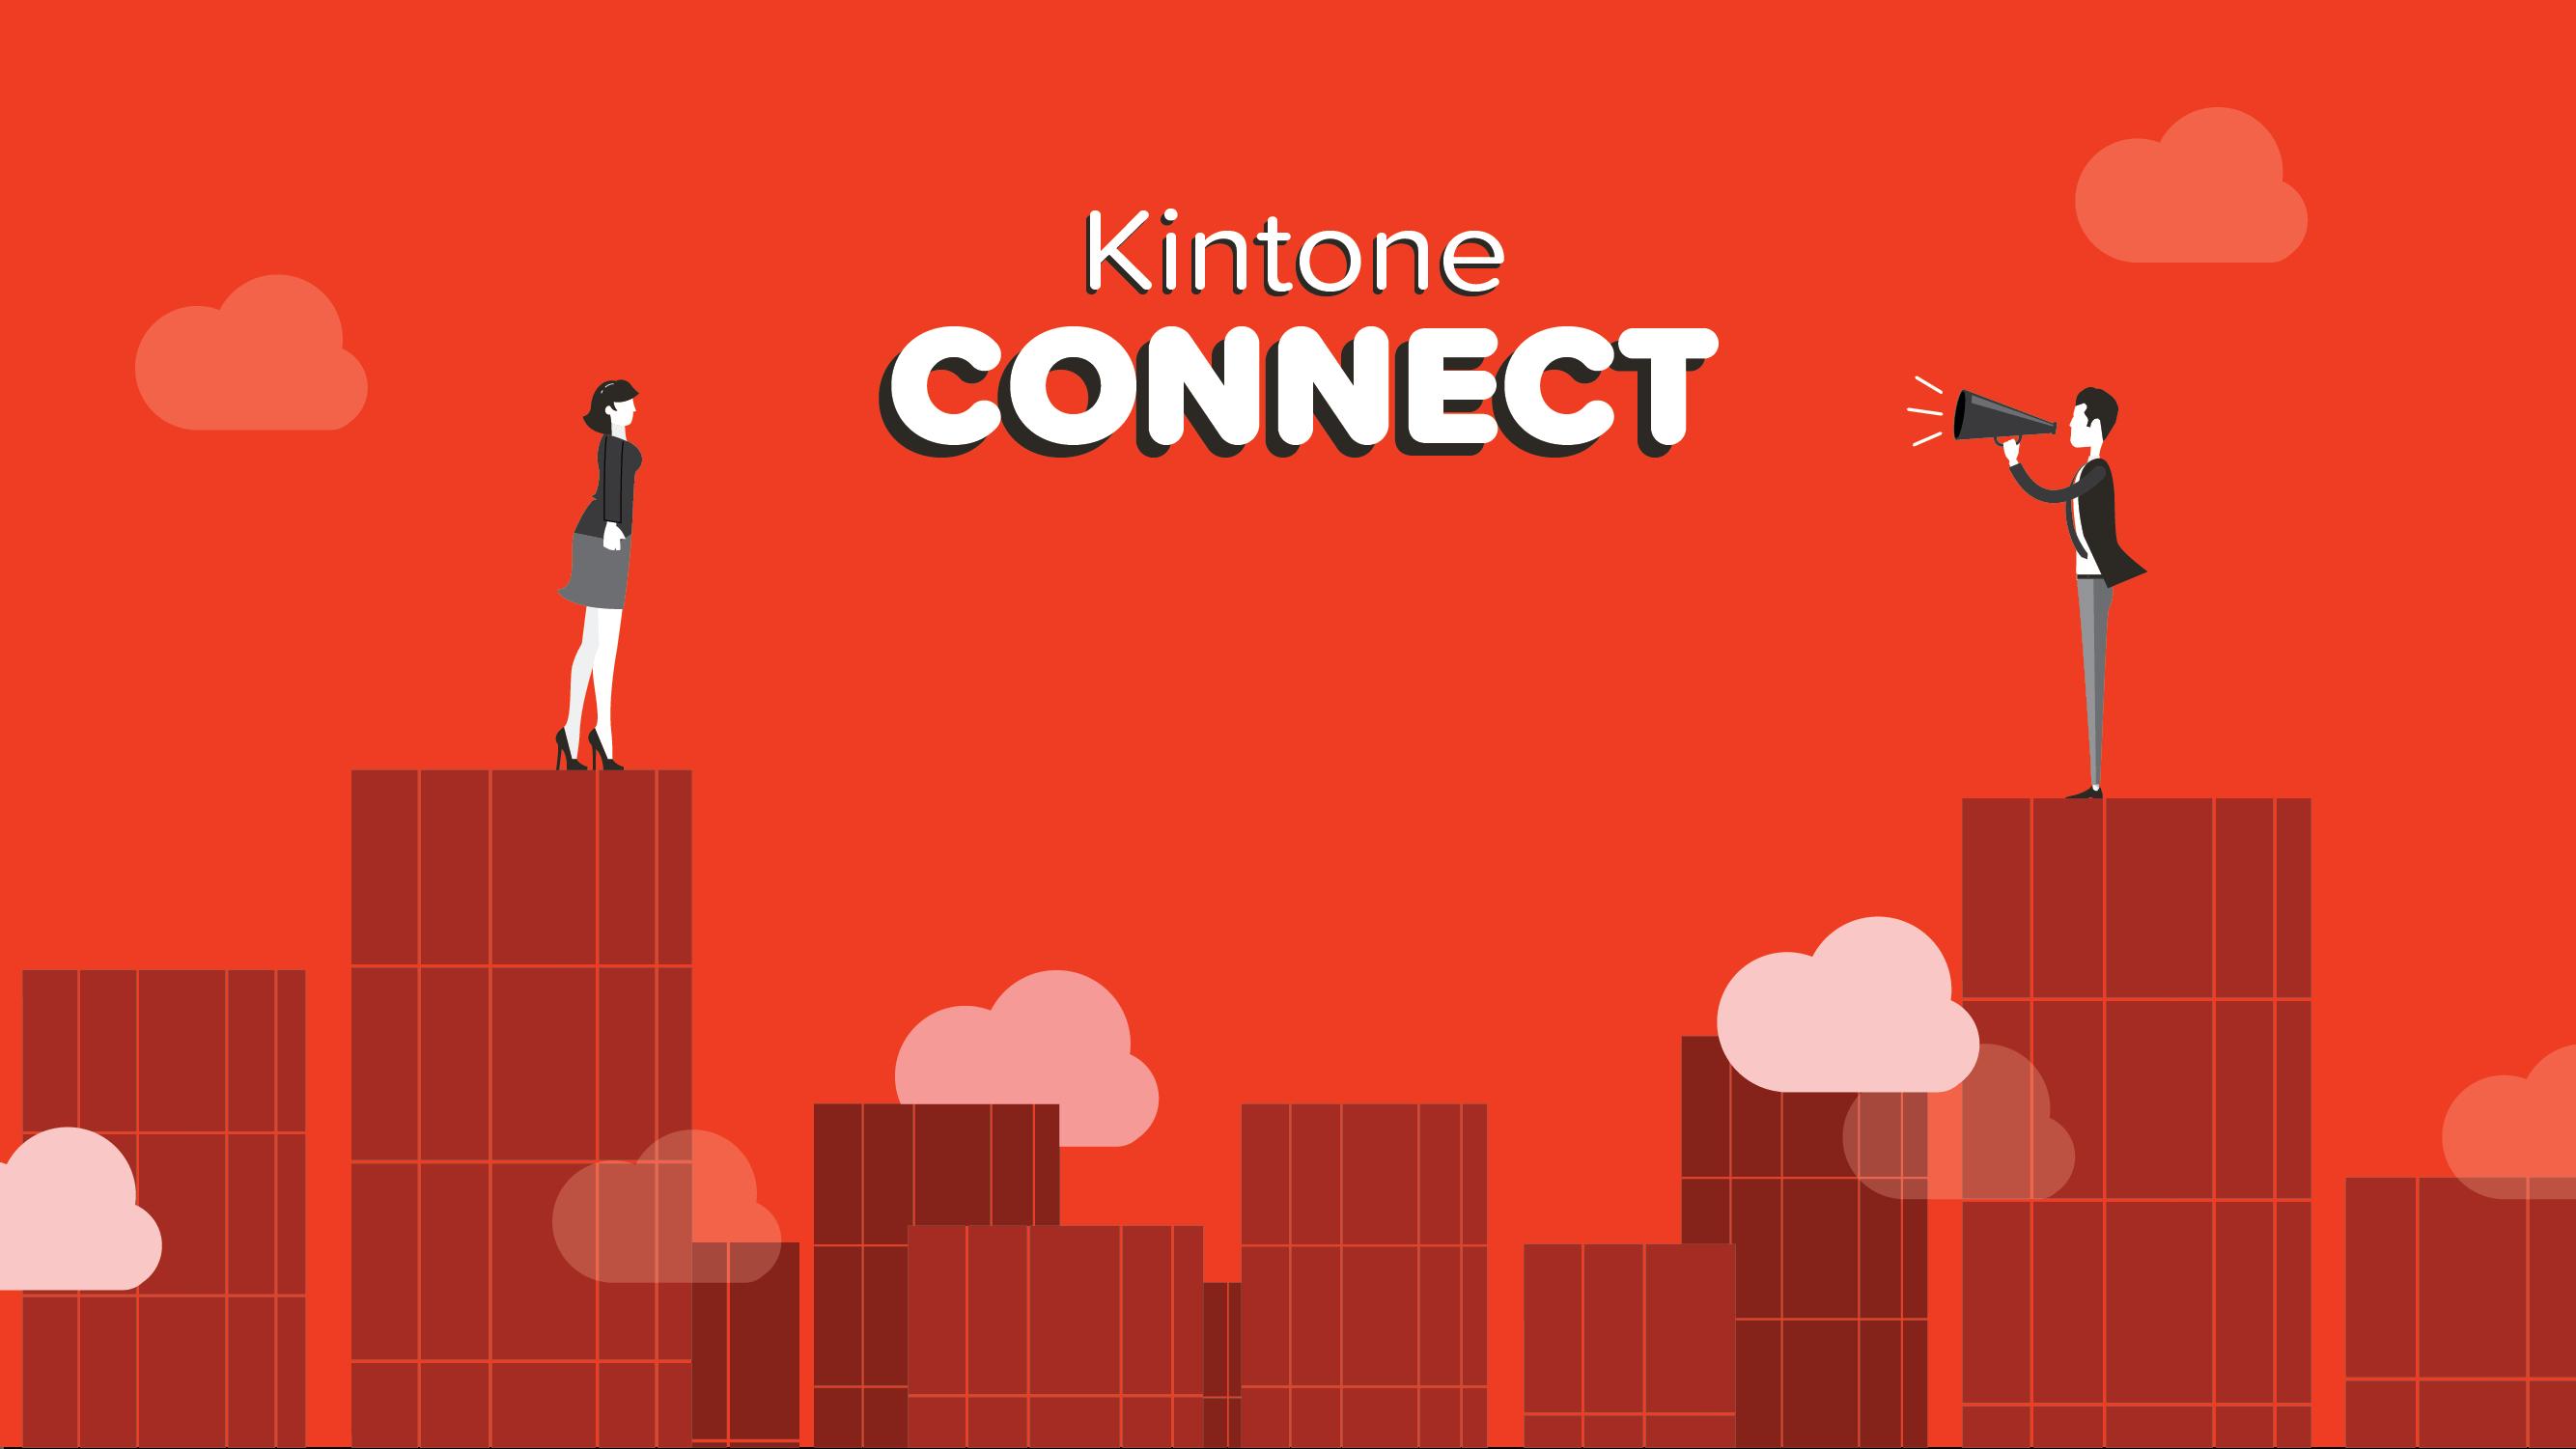 Kintone Connect 2018